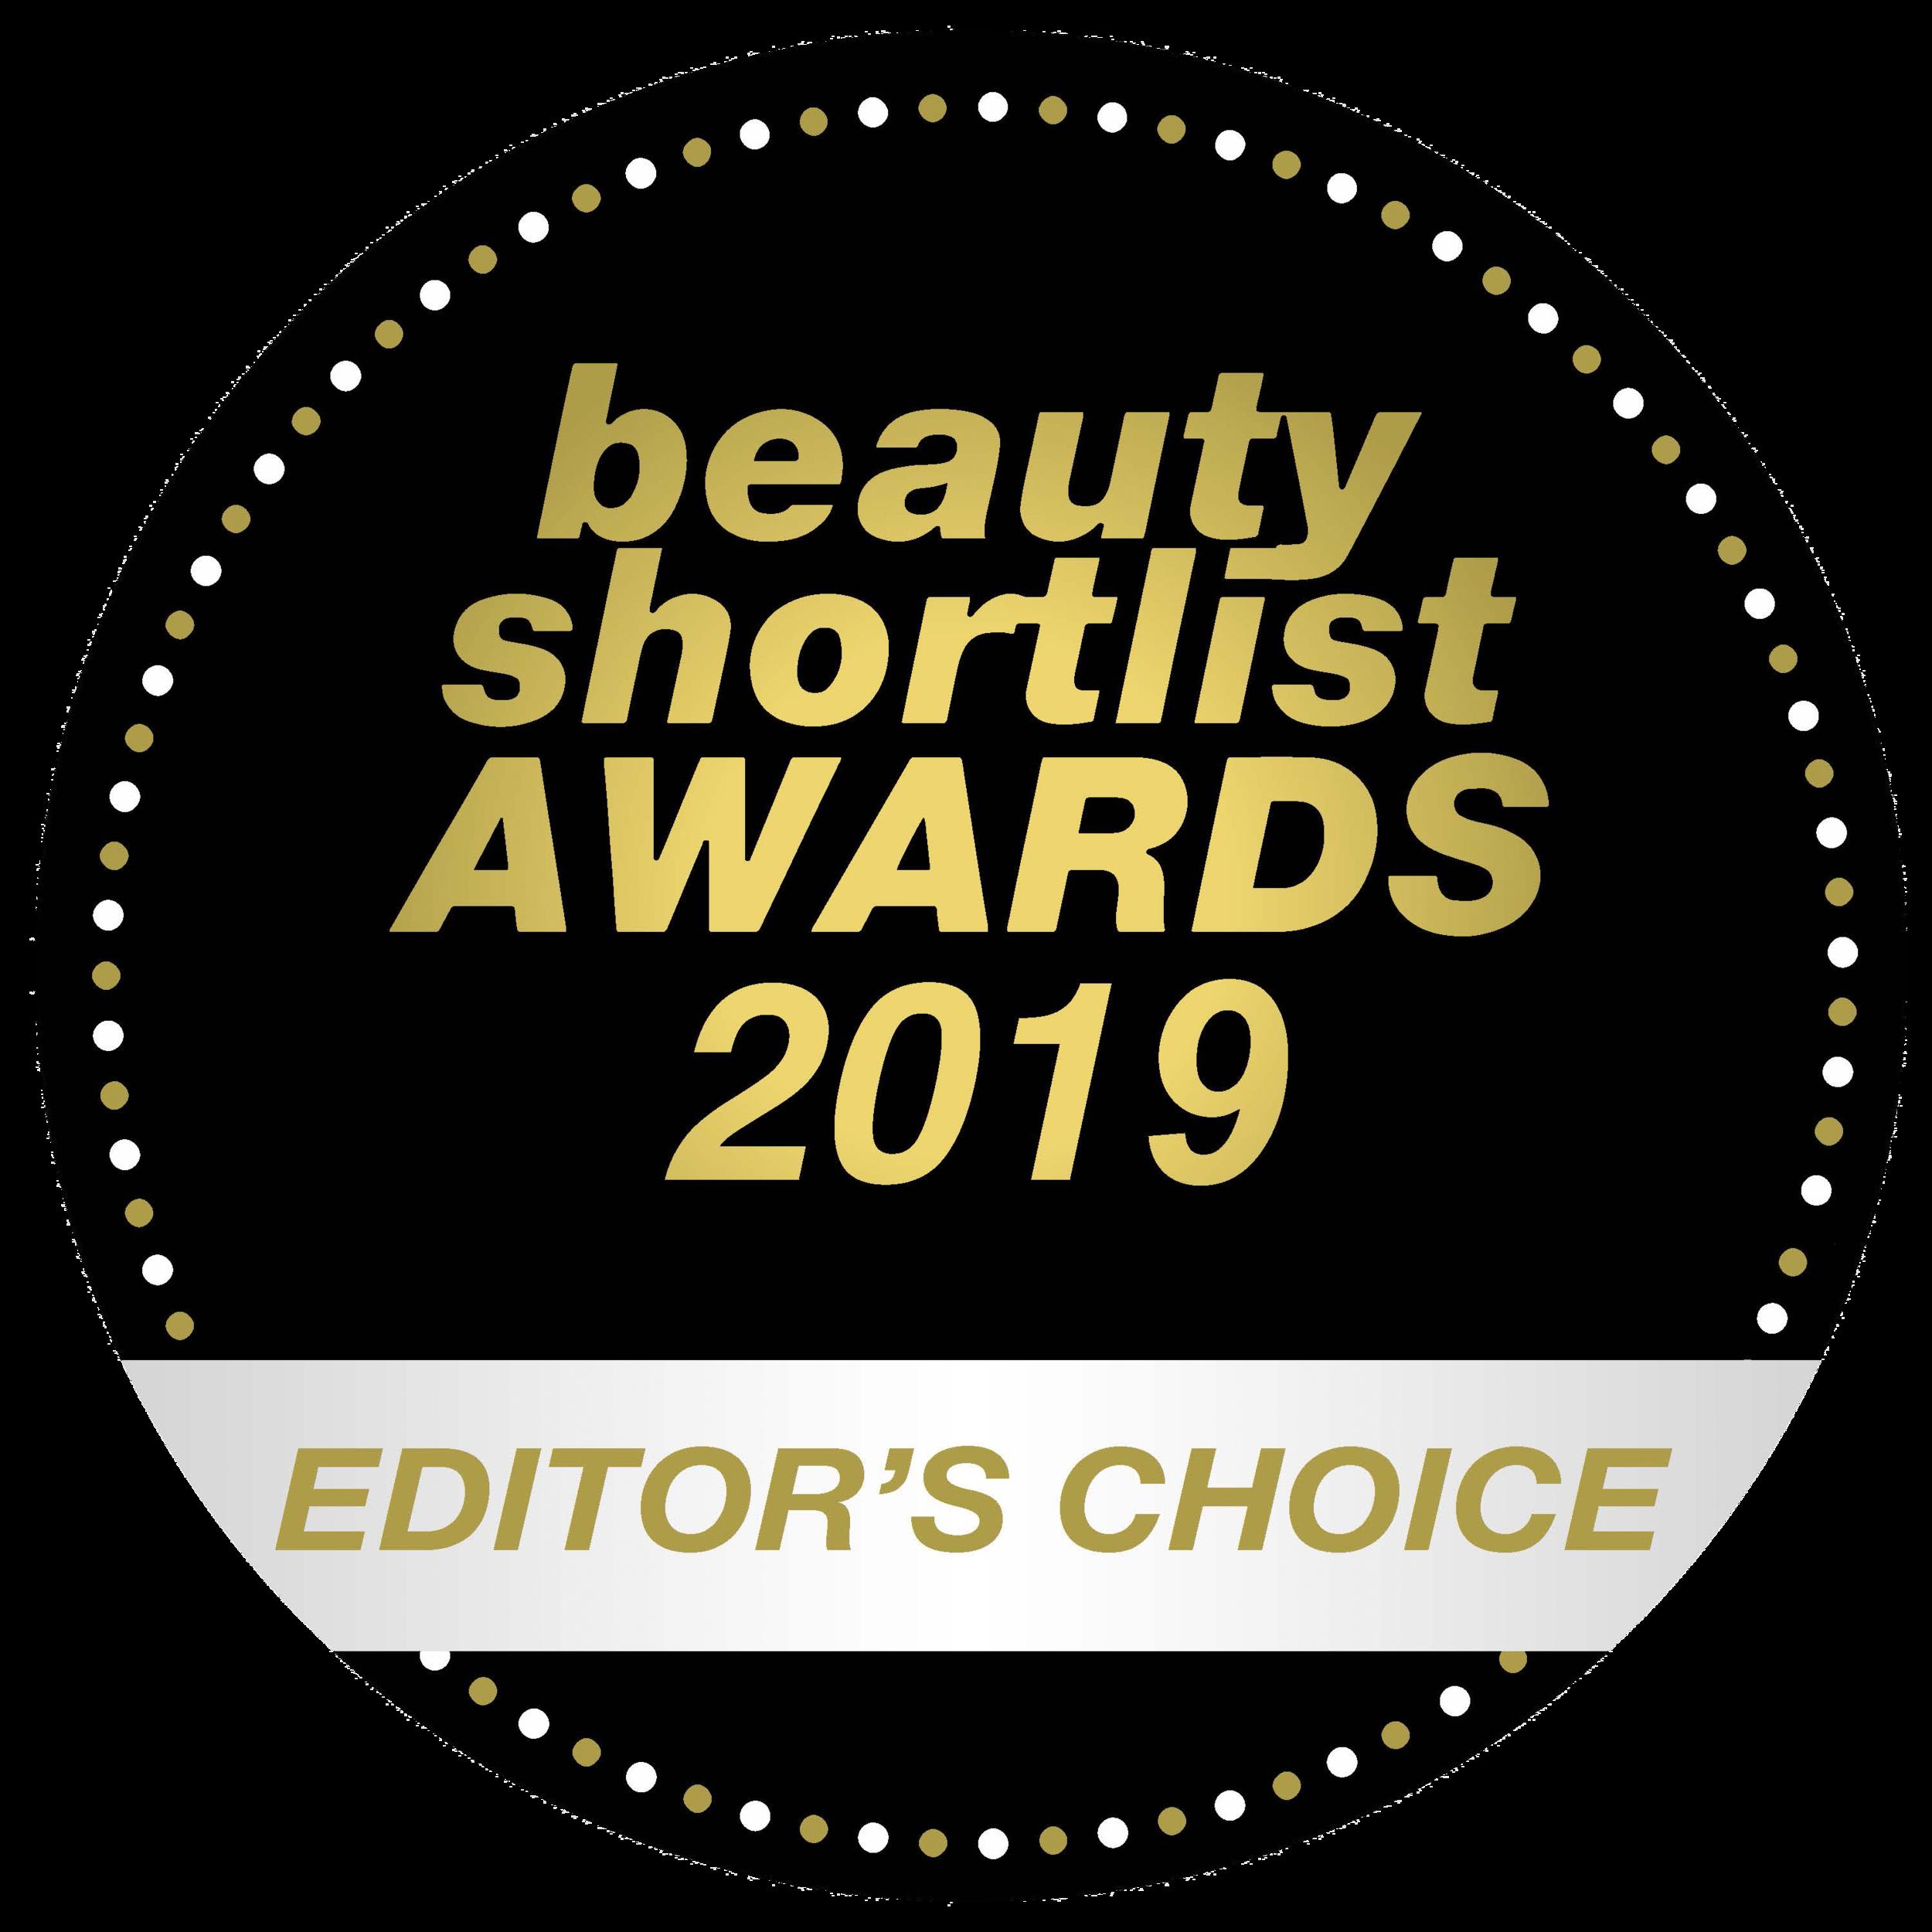 BSL---Editors-Choice-2019.png